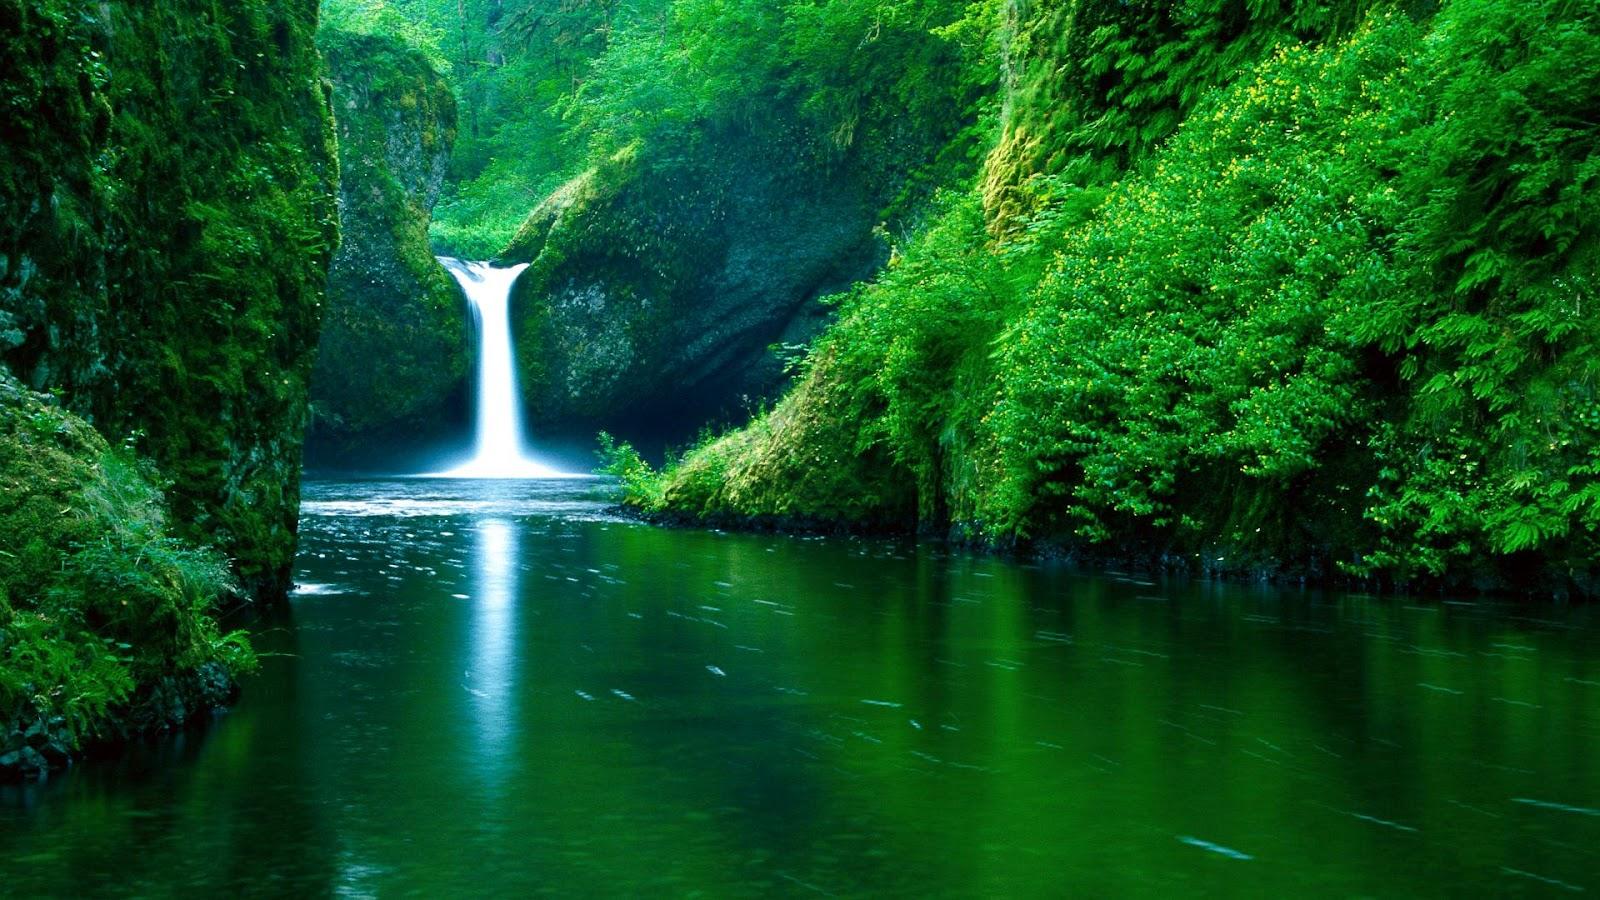 Wallpaper proslut full hd waterfall nature wallpapers - Green nature wallpaper full hd ...